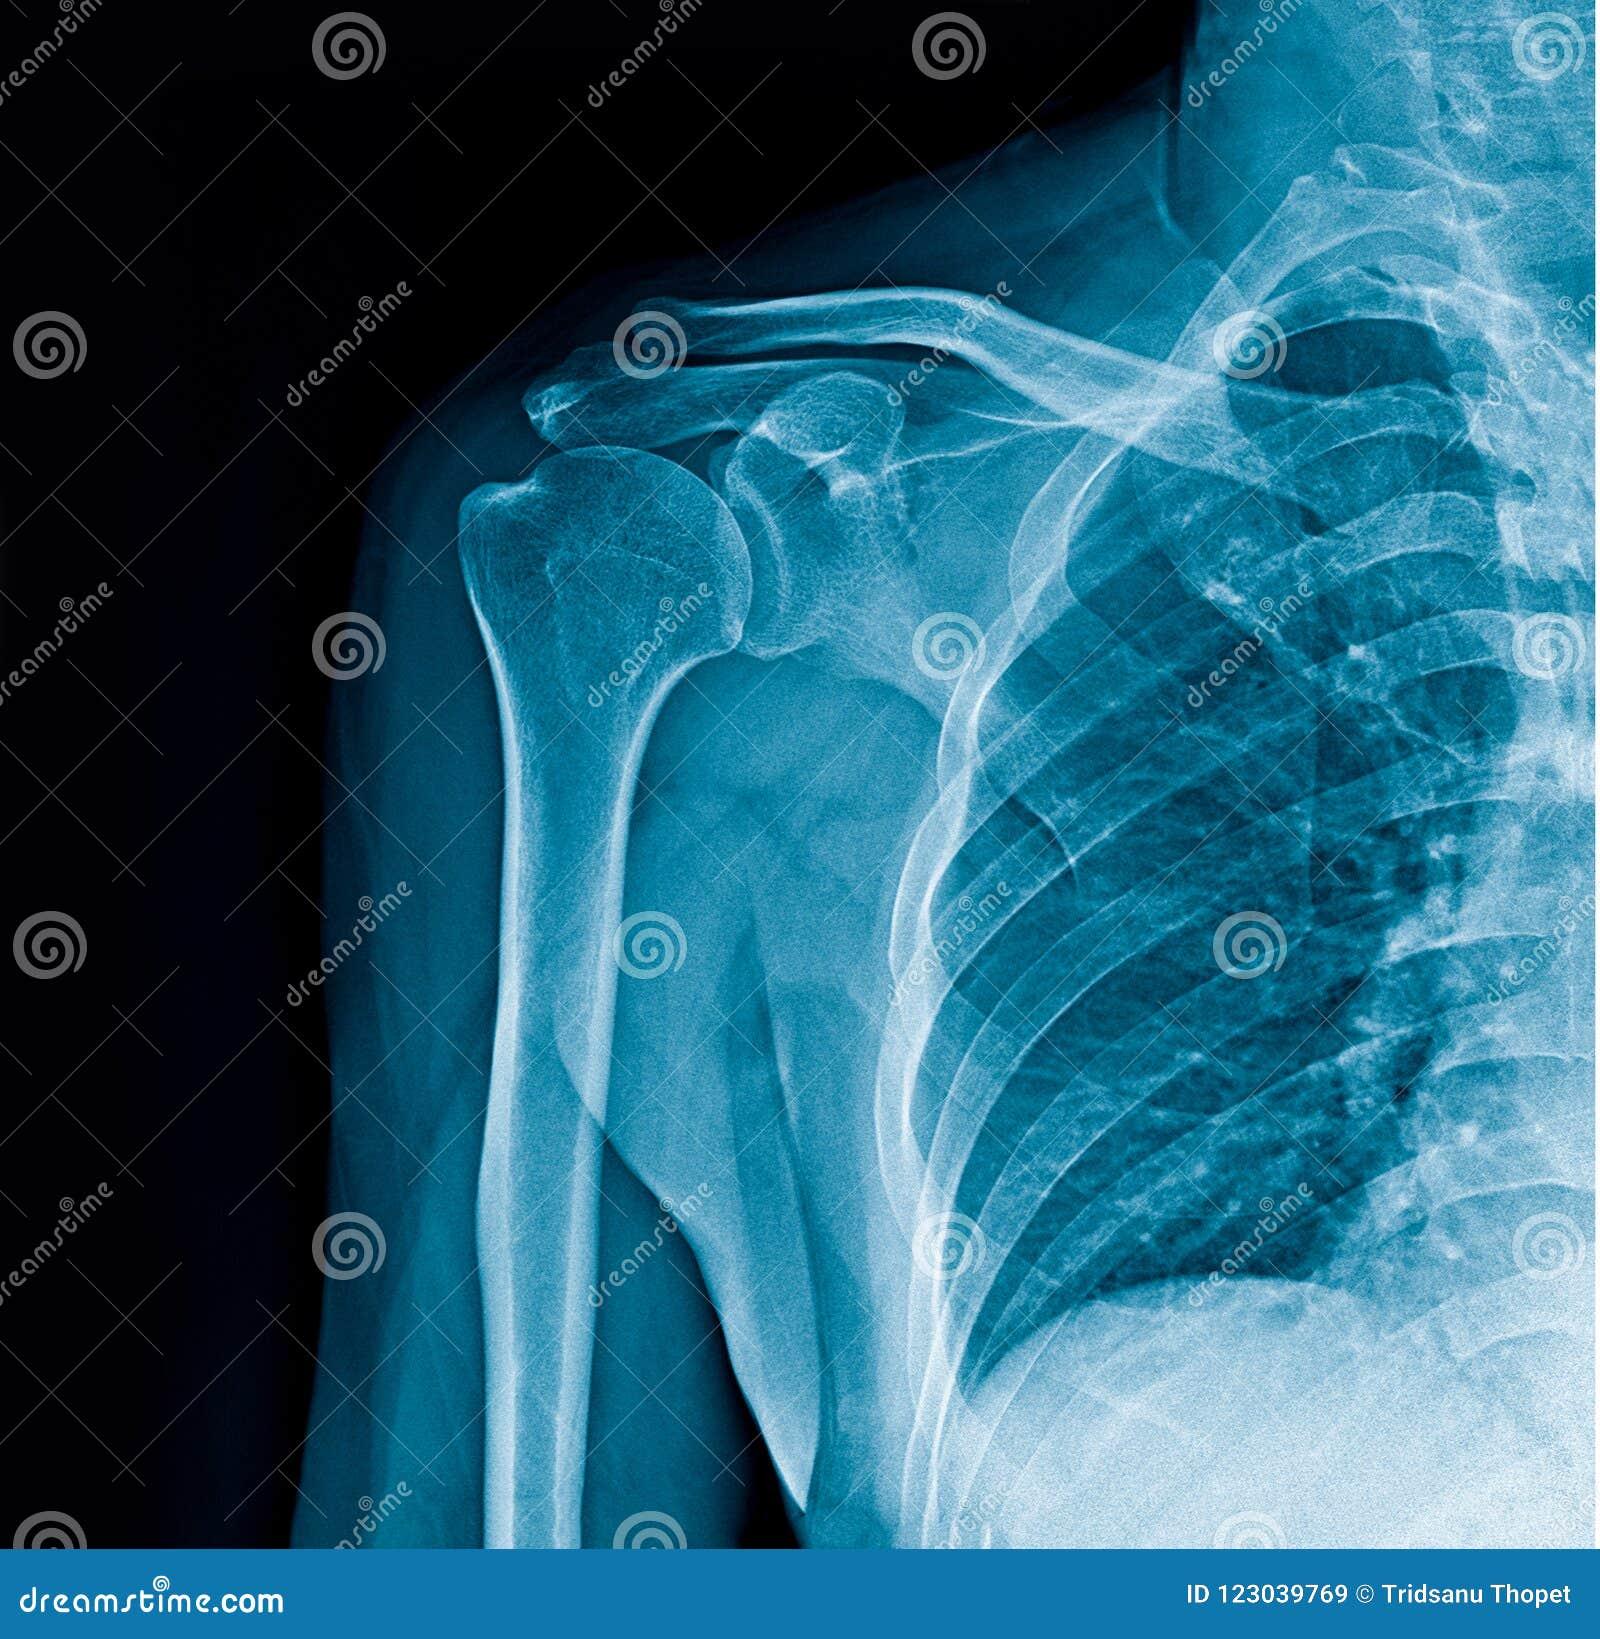 Shoulder x-ray banner, shoulder x-ray on black background